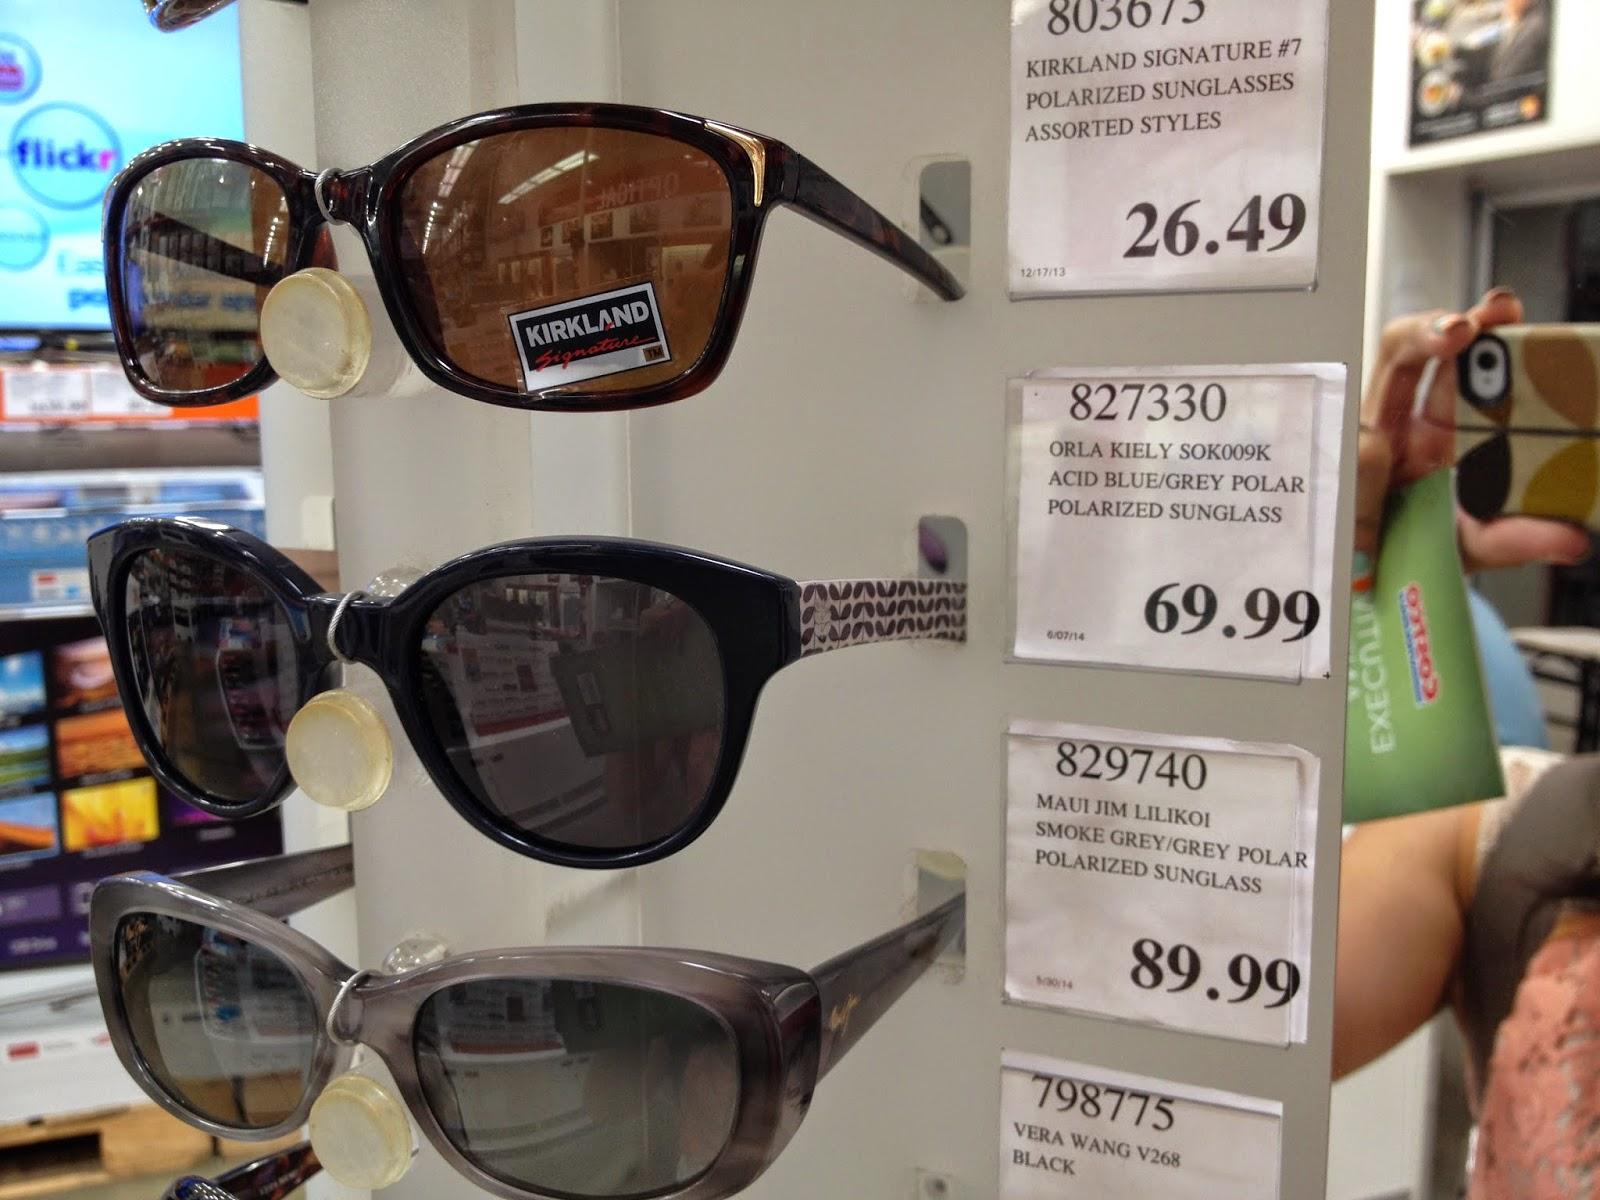 2e2176ae16 Sunglasses only in costco cinemas JPG 1600x1200 Kirkland sunglasses